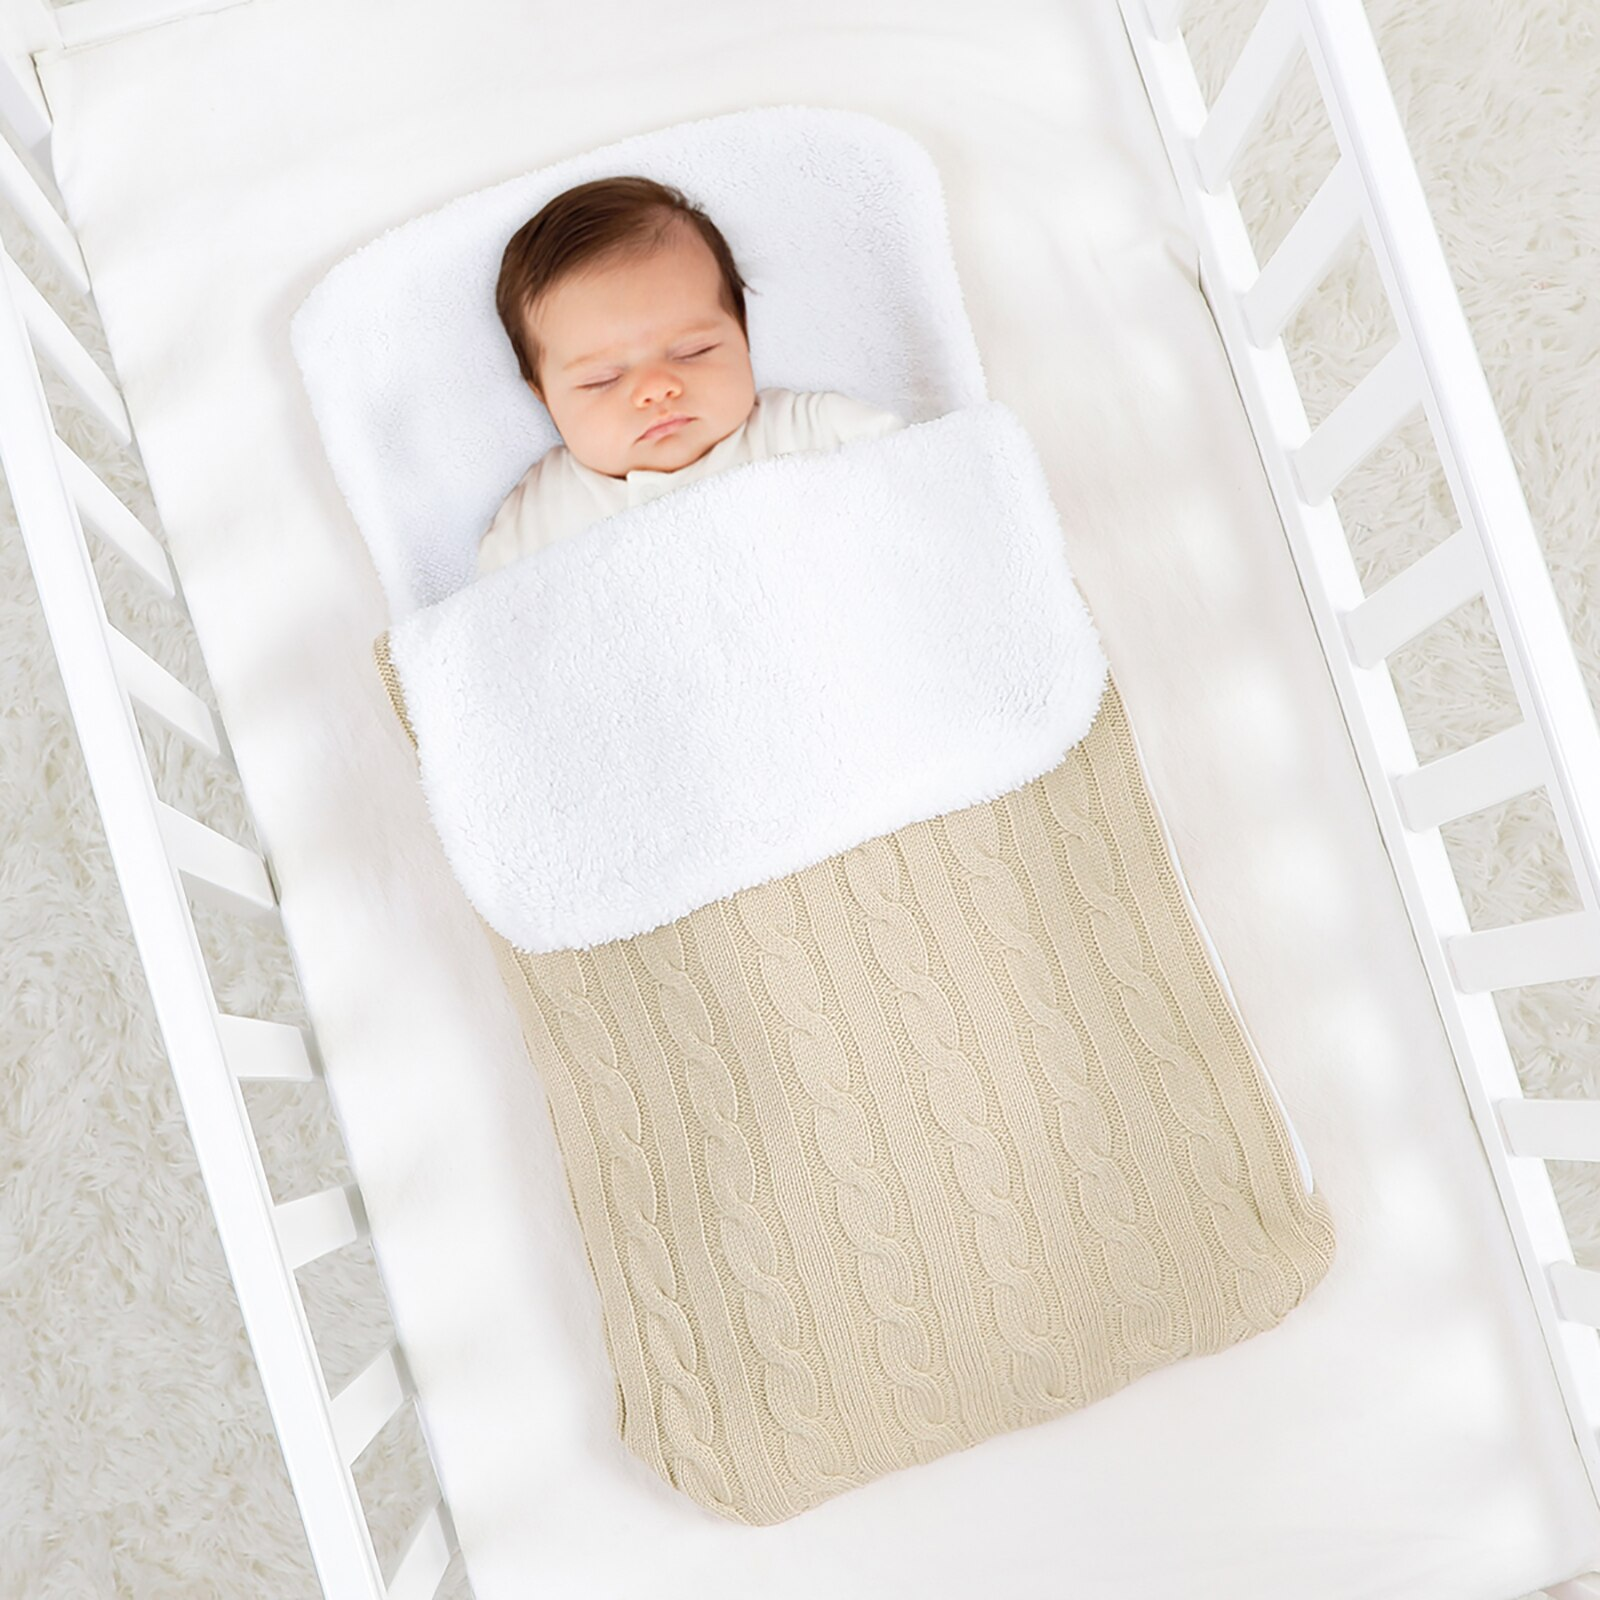 Baby Sleeping Bag Ultra-Soft Fluffy Fleece Newborn Receiving Blanket Infant Boys Girls Clothes Sleeping Nursery Wrap Swaddle